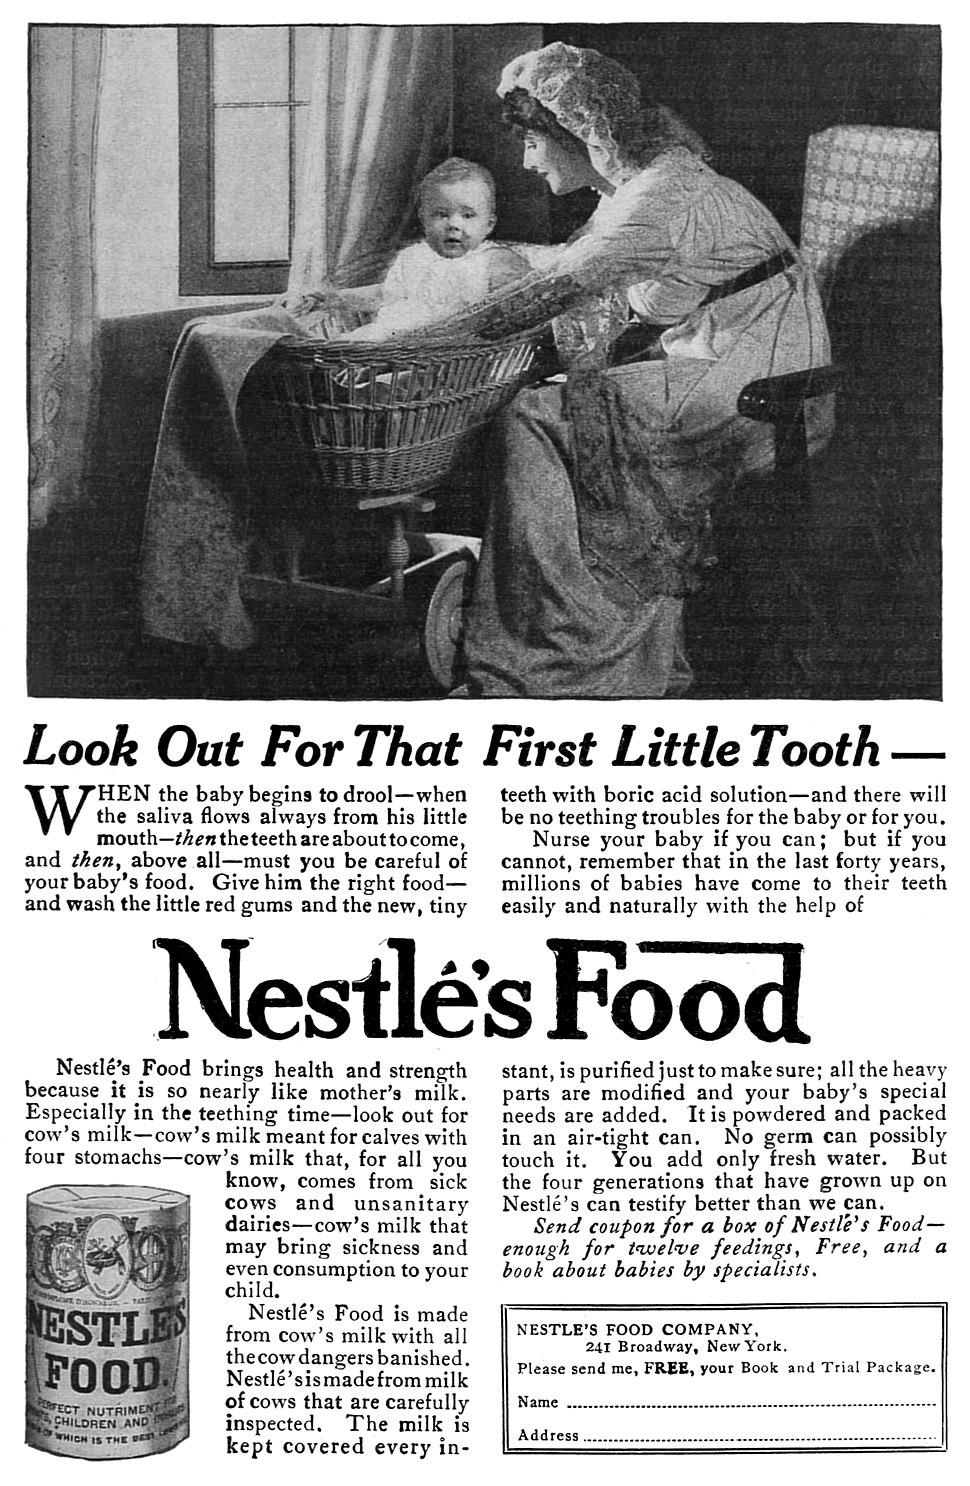 Nestl%C3%A9 Food advertisement, 1915